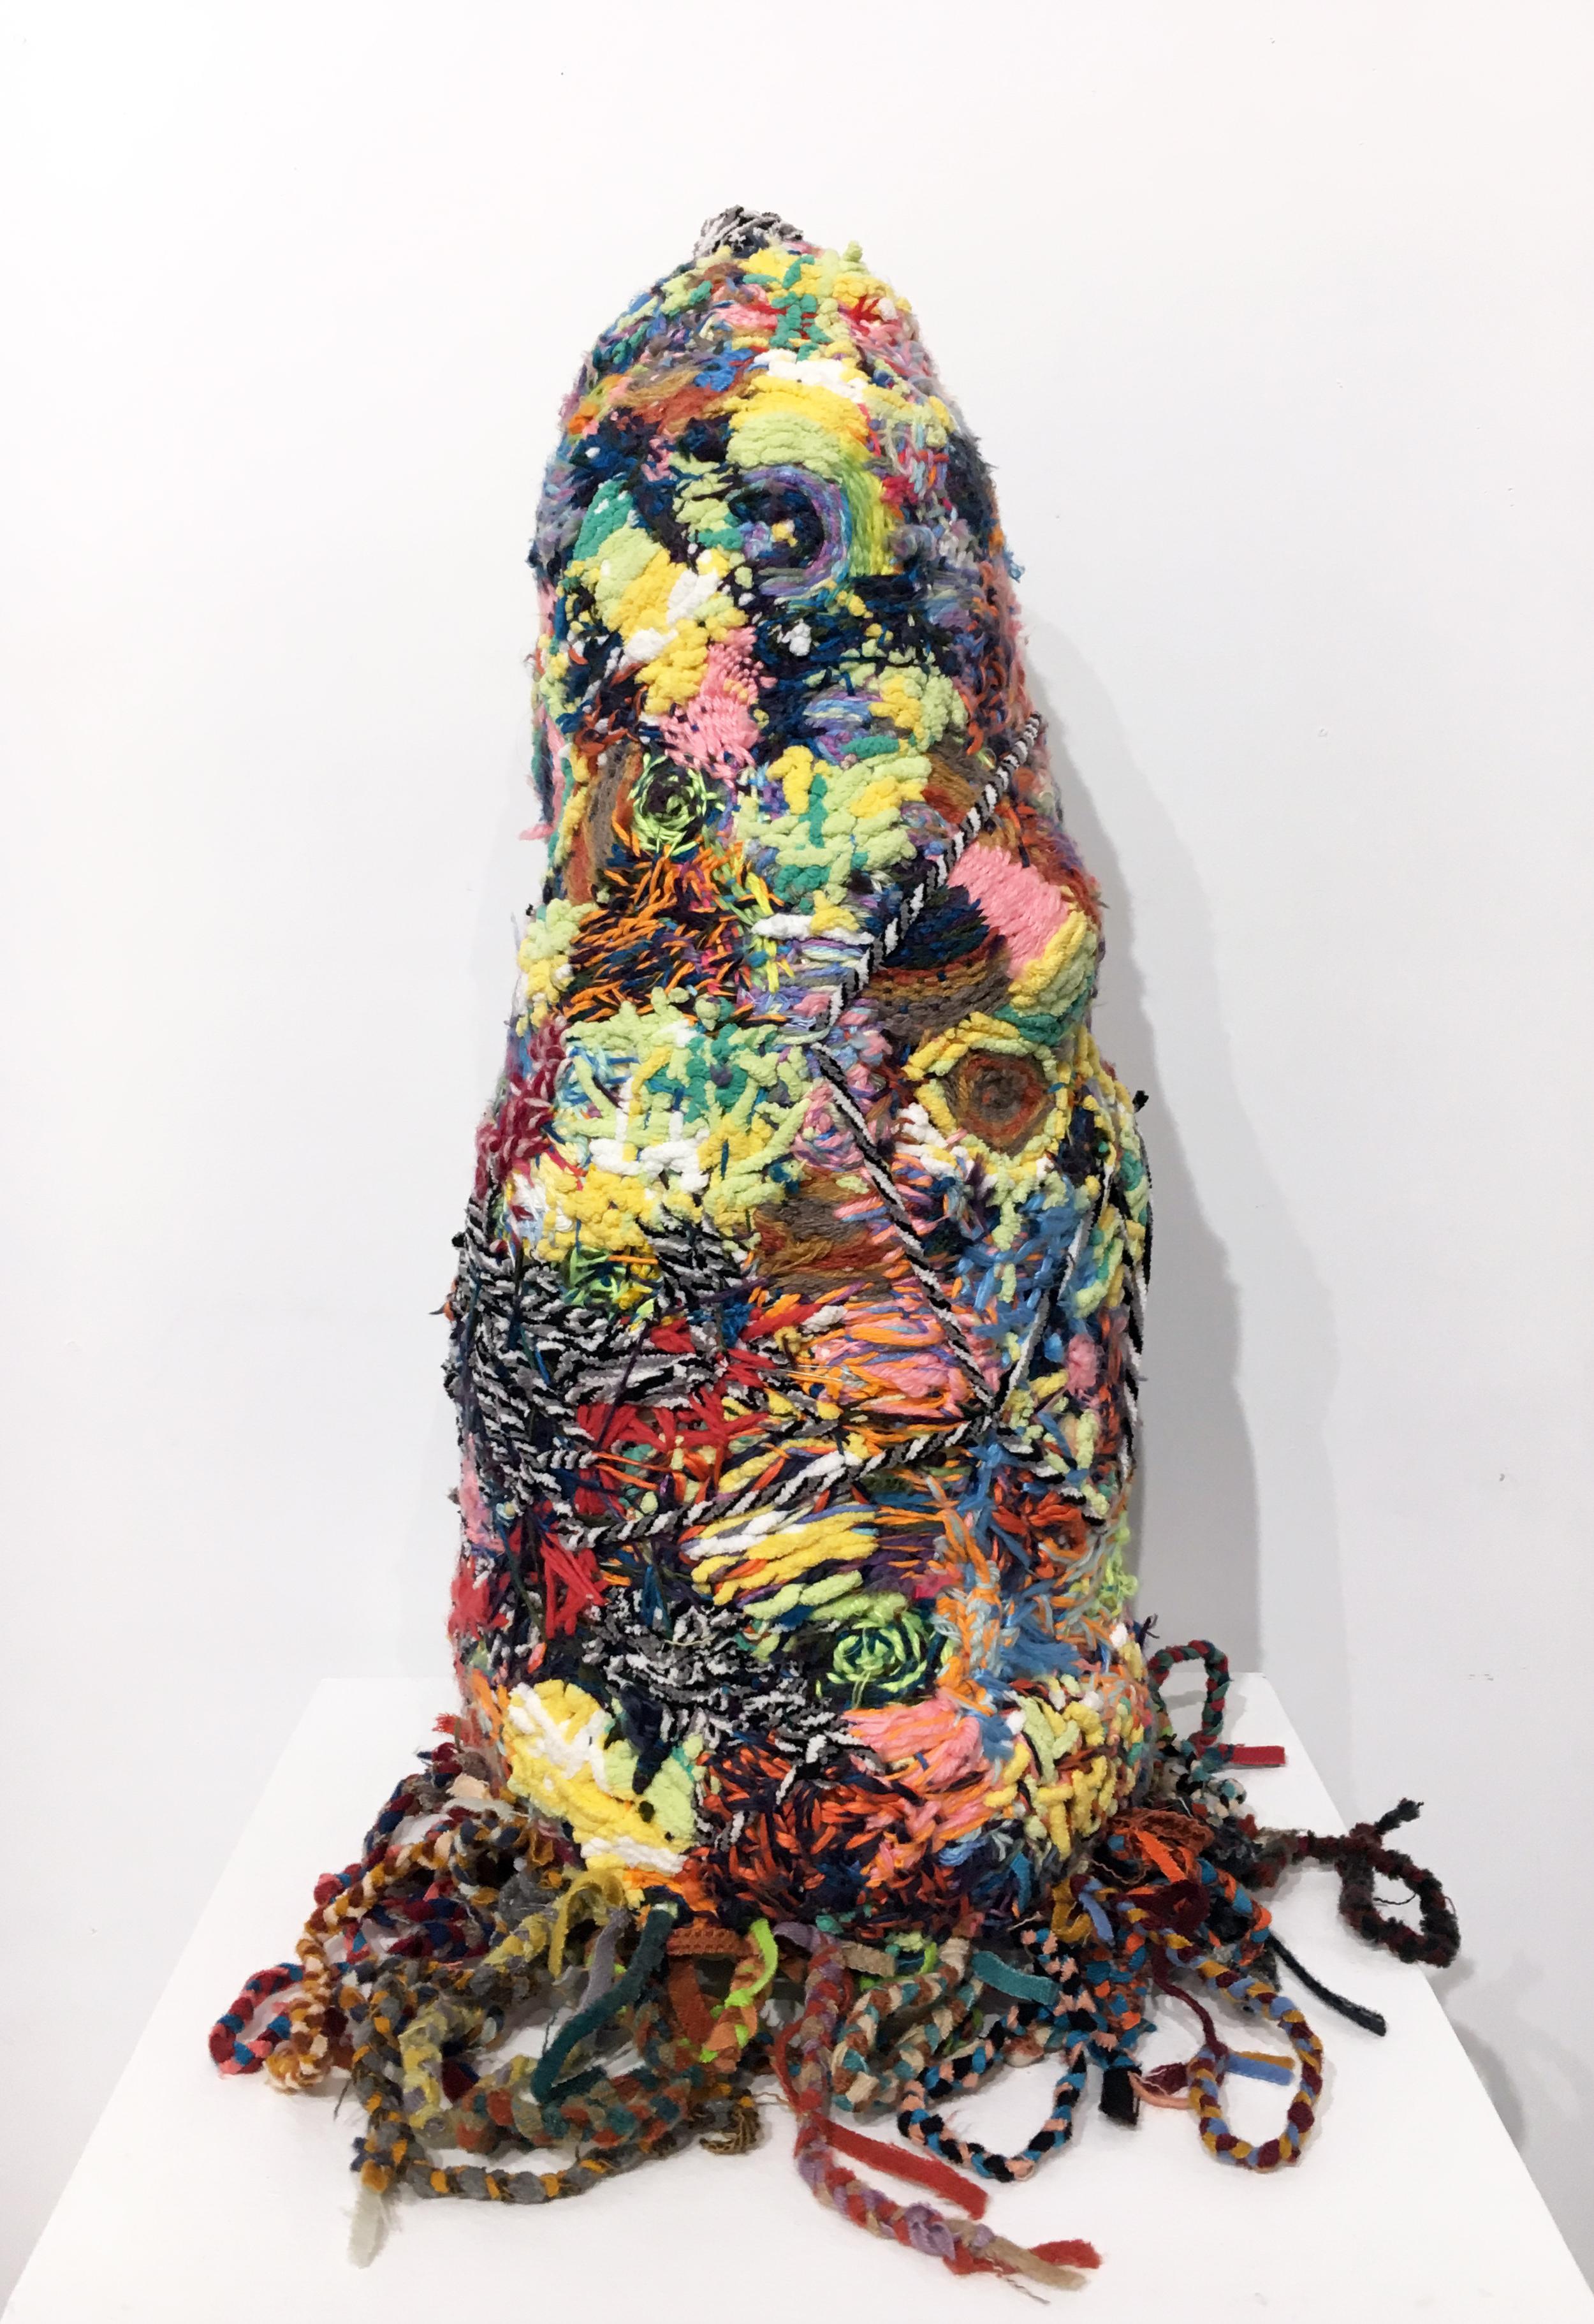 """The Homunculus"", Contemporary, Mixed Media, Sculpture, Thread, Wool, Foam, Soft"